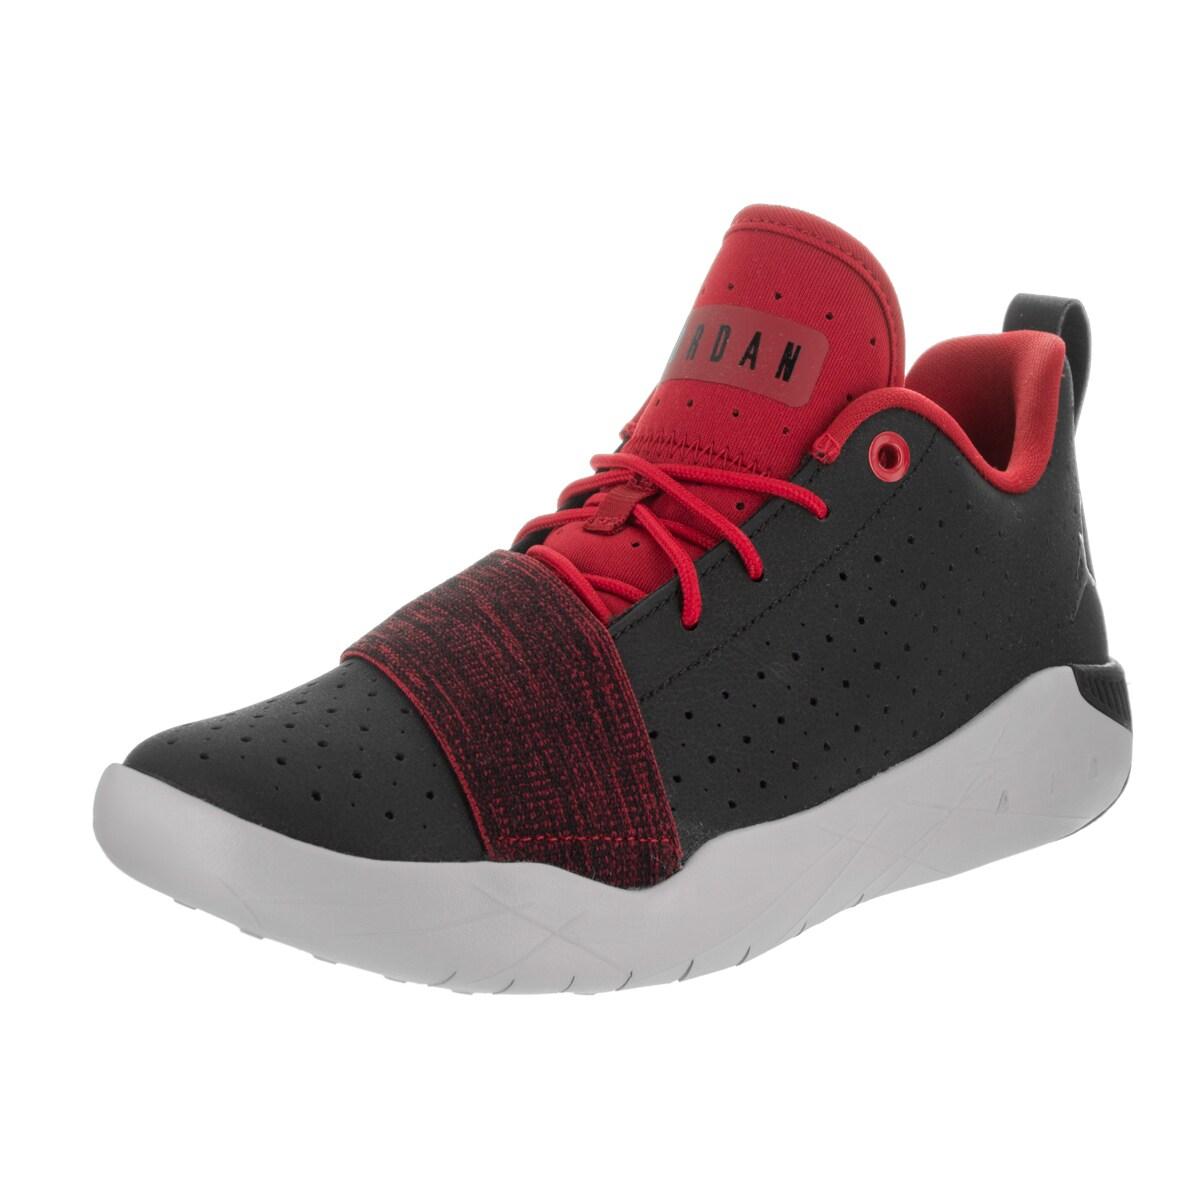 a30fe3202225ee Shop Nike Jordan Kids Jordan 23 Breakout Bg Basketball Shoe - Free ...